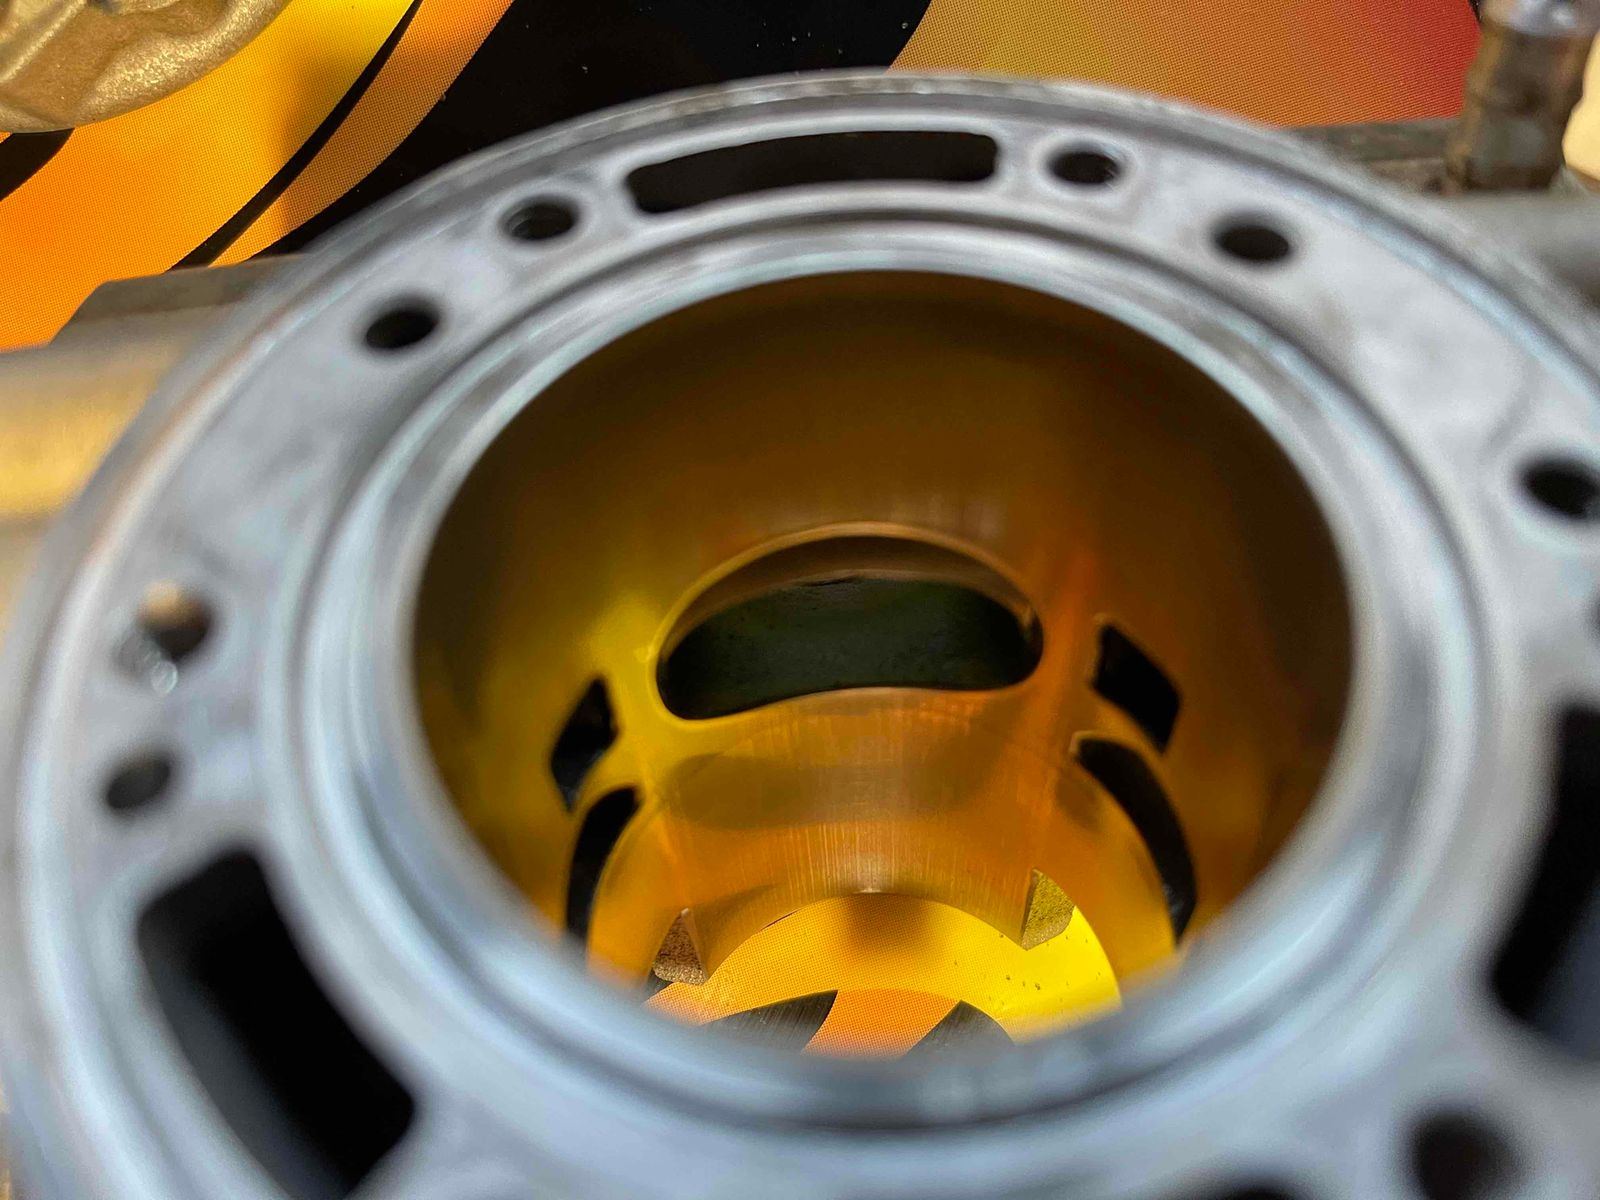 Husky/KTM Cylinder 85cc, Head, Insert, Cdi, Powervalve, Linkage